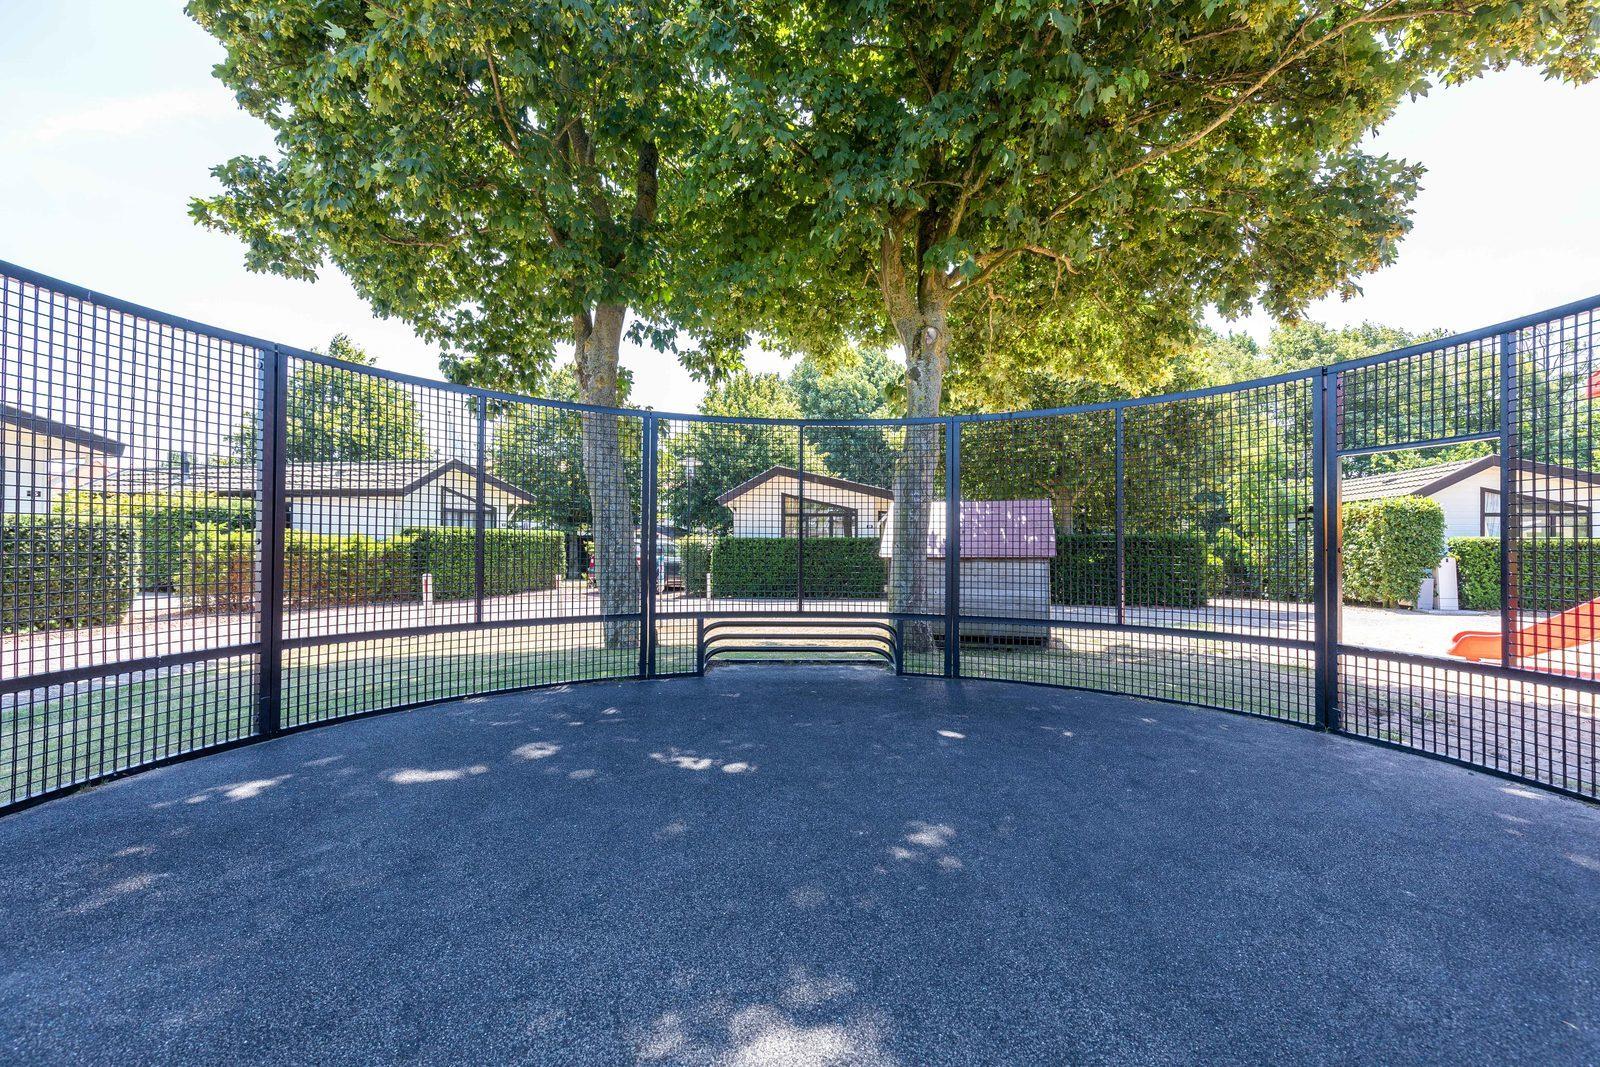 Terrain de street soccer